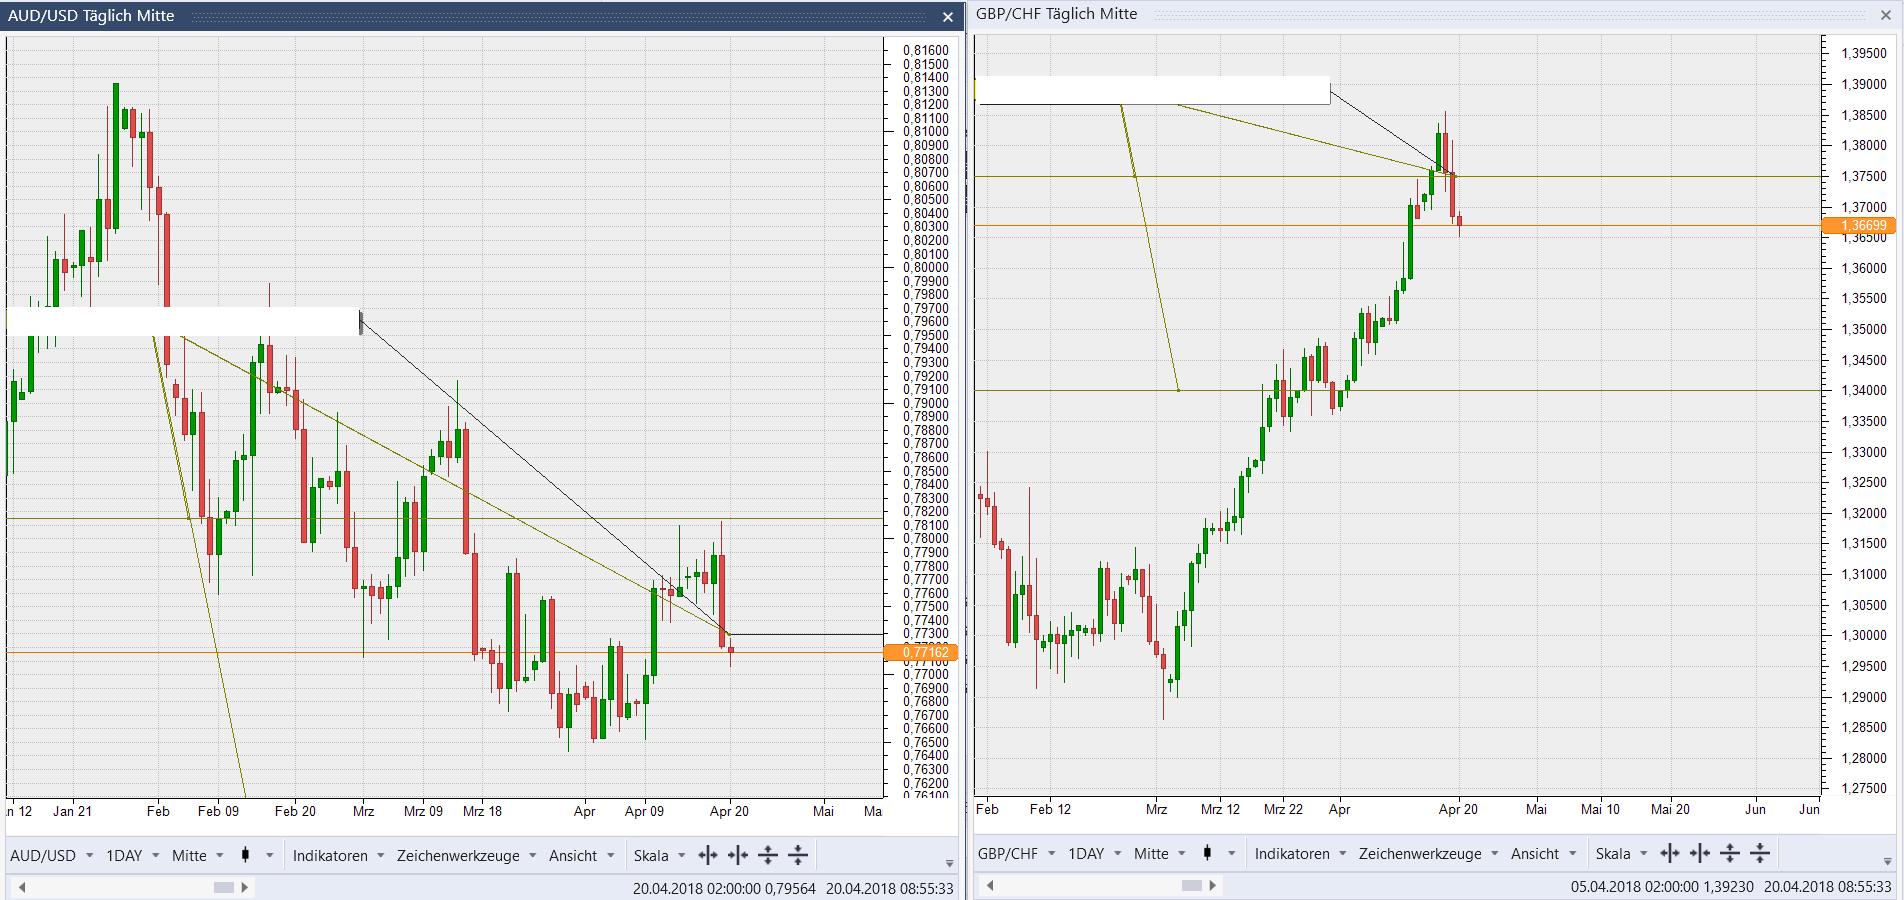 AUD/USD & GBP/CHF Tages Chart: Jeweil ein Umkehrstab Upthrust Pattern aktiv